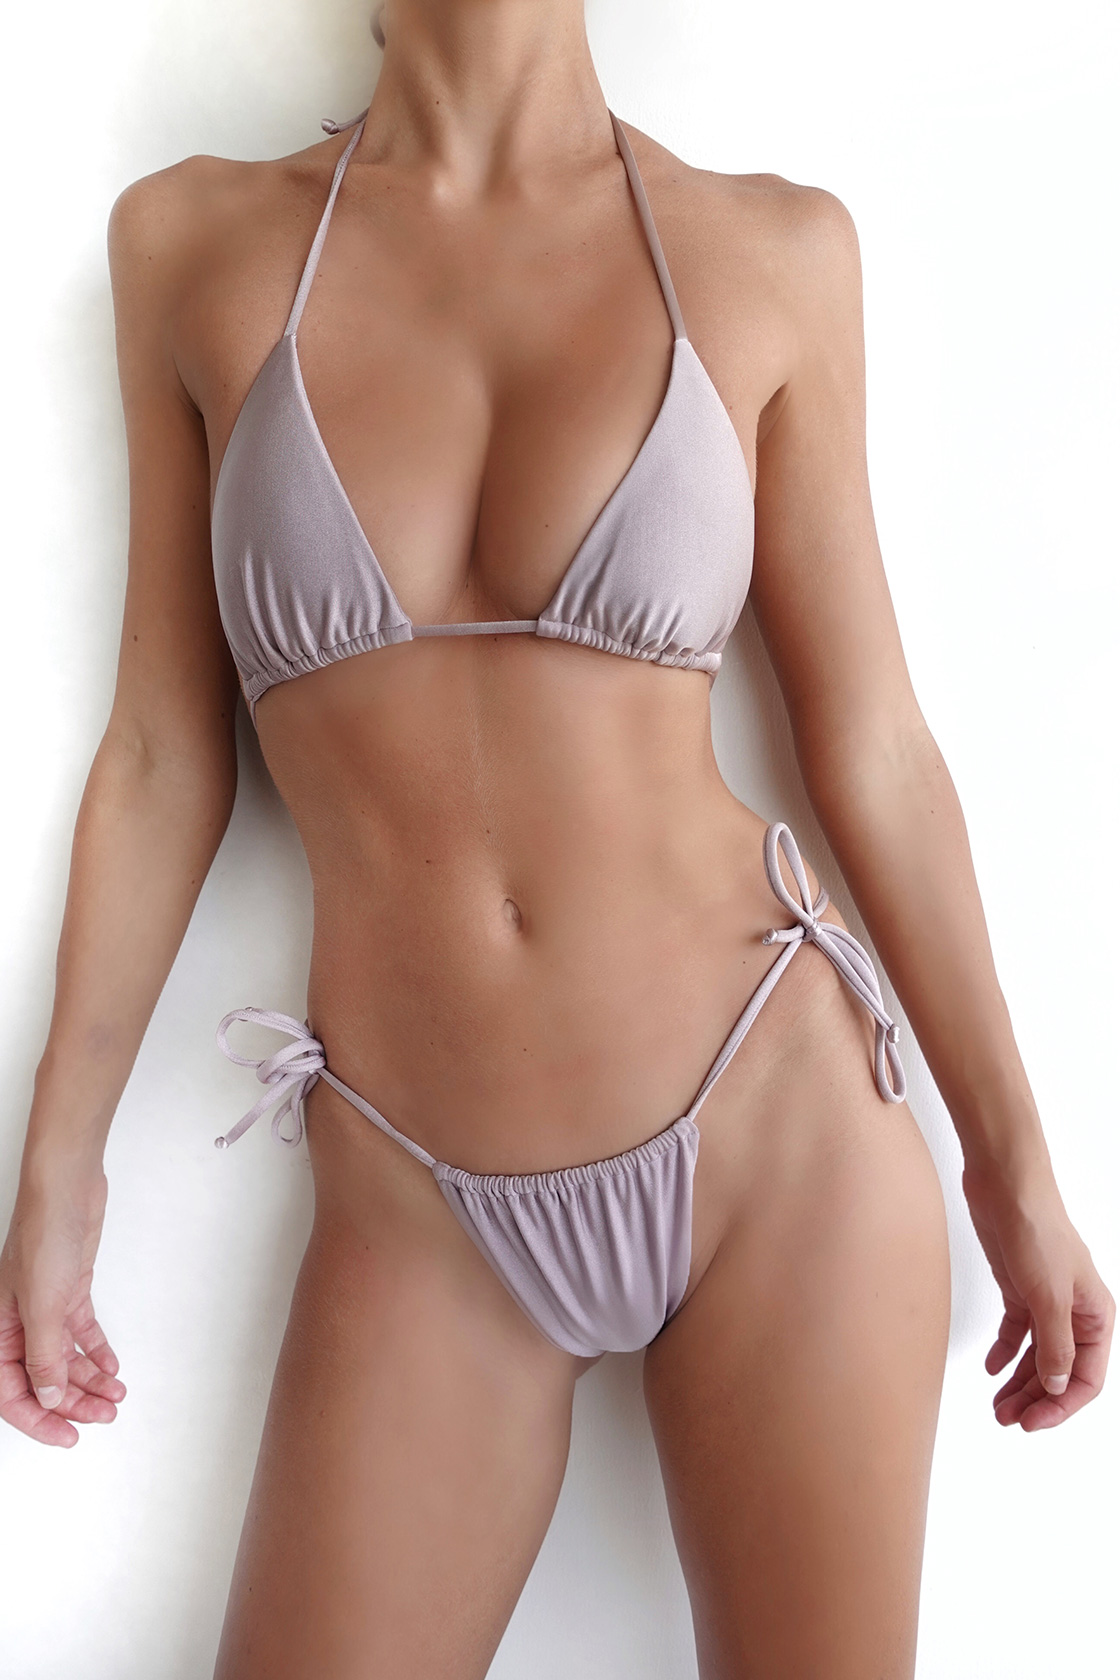 Bikini competition sale